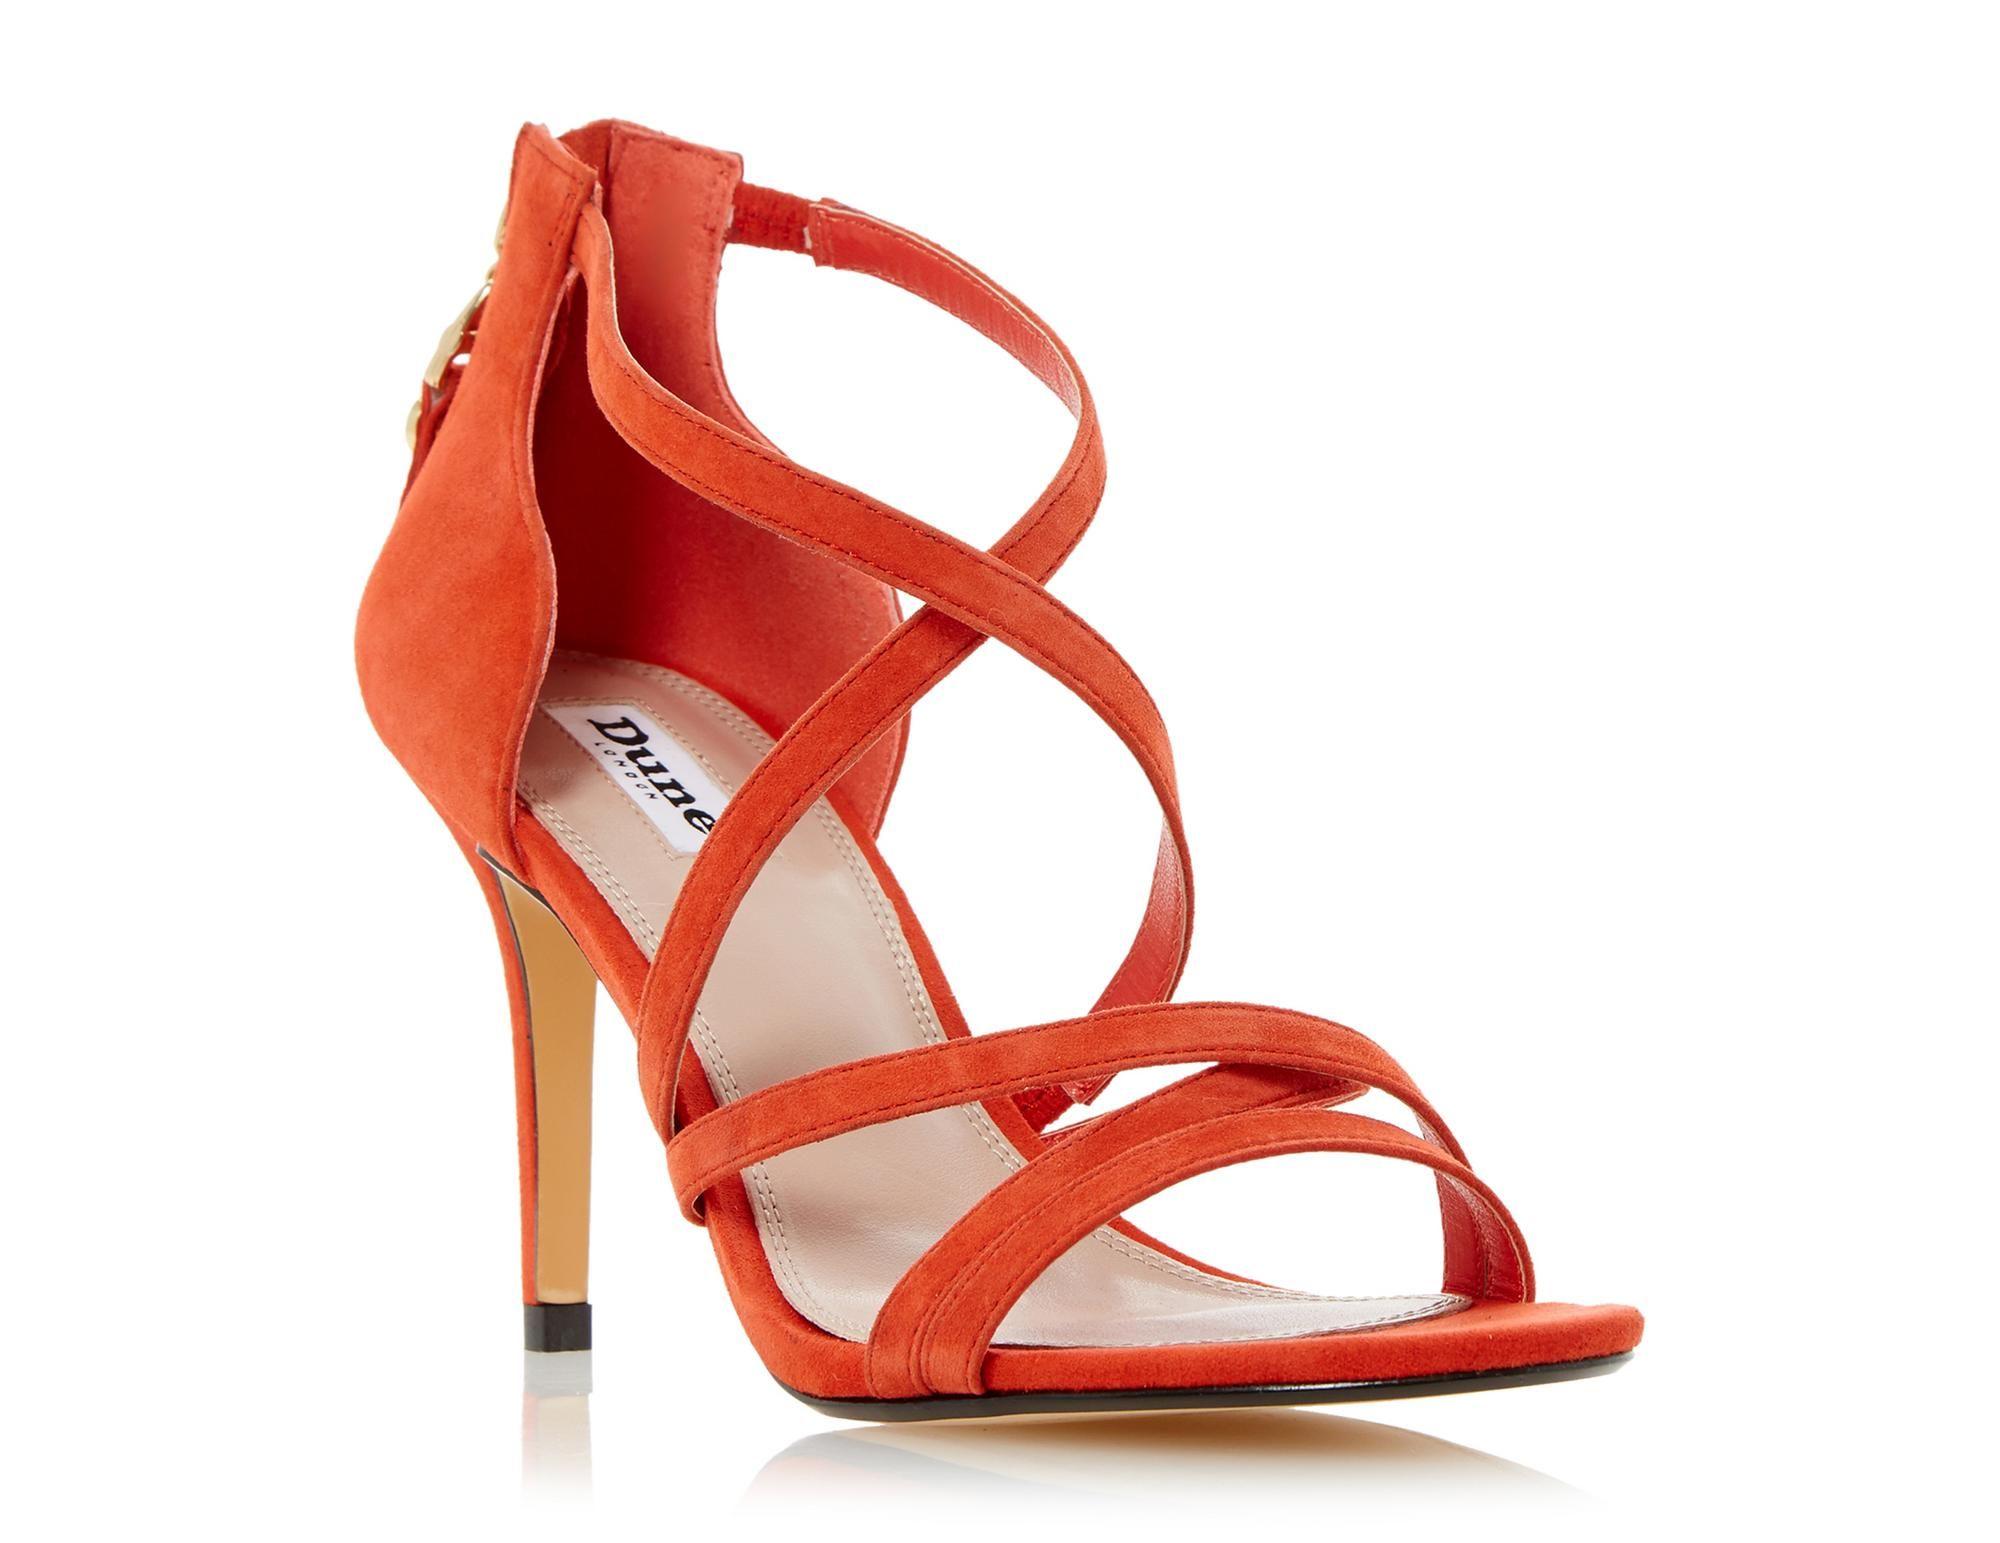 Women's High Block Heel Sandals Fashion Cross Straps Zipper Shoes